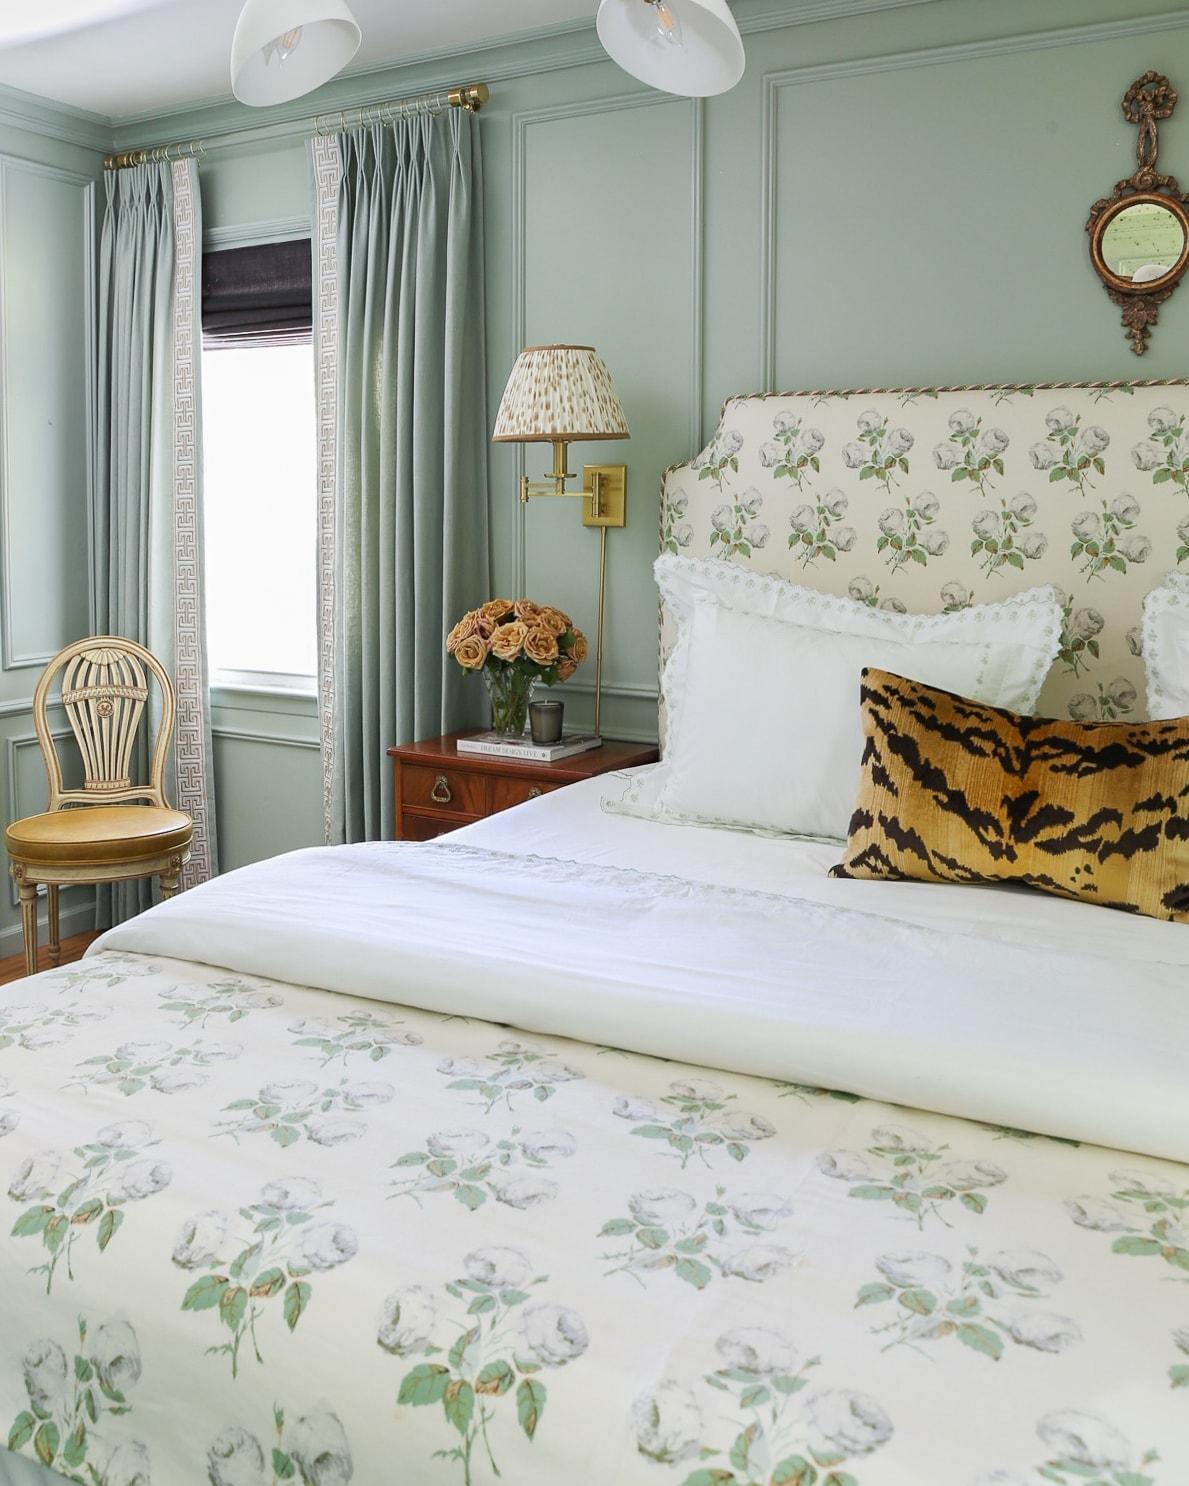 tiger-velvet-pillow-grandmillennial-bedroom-ideas